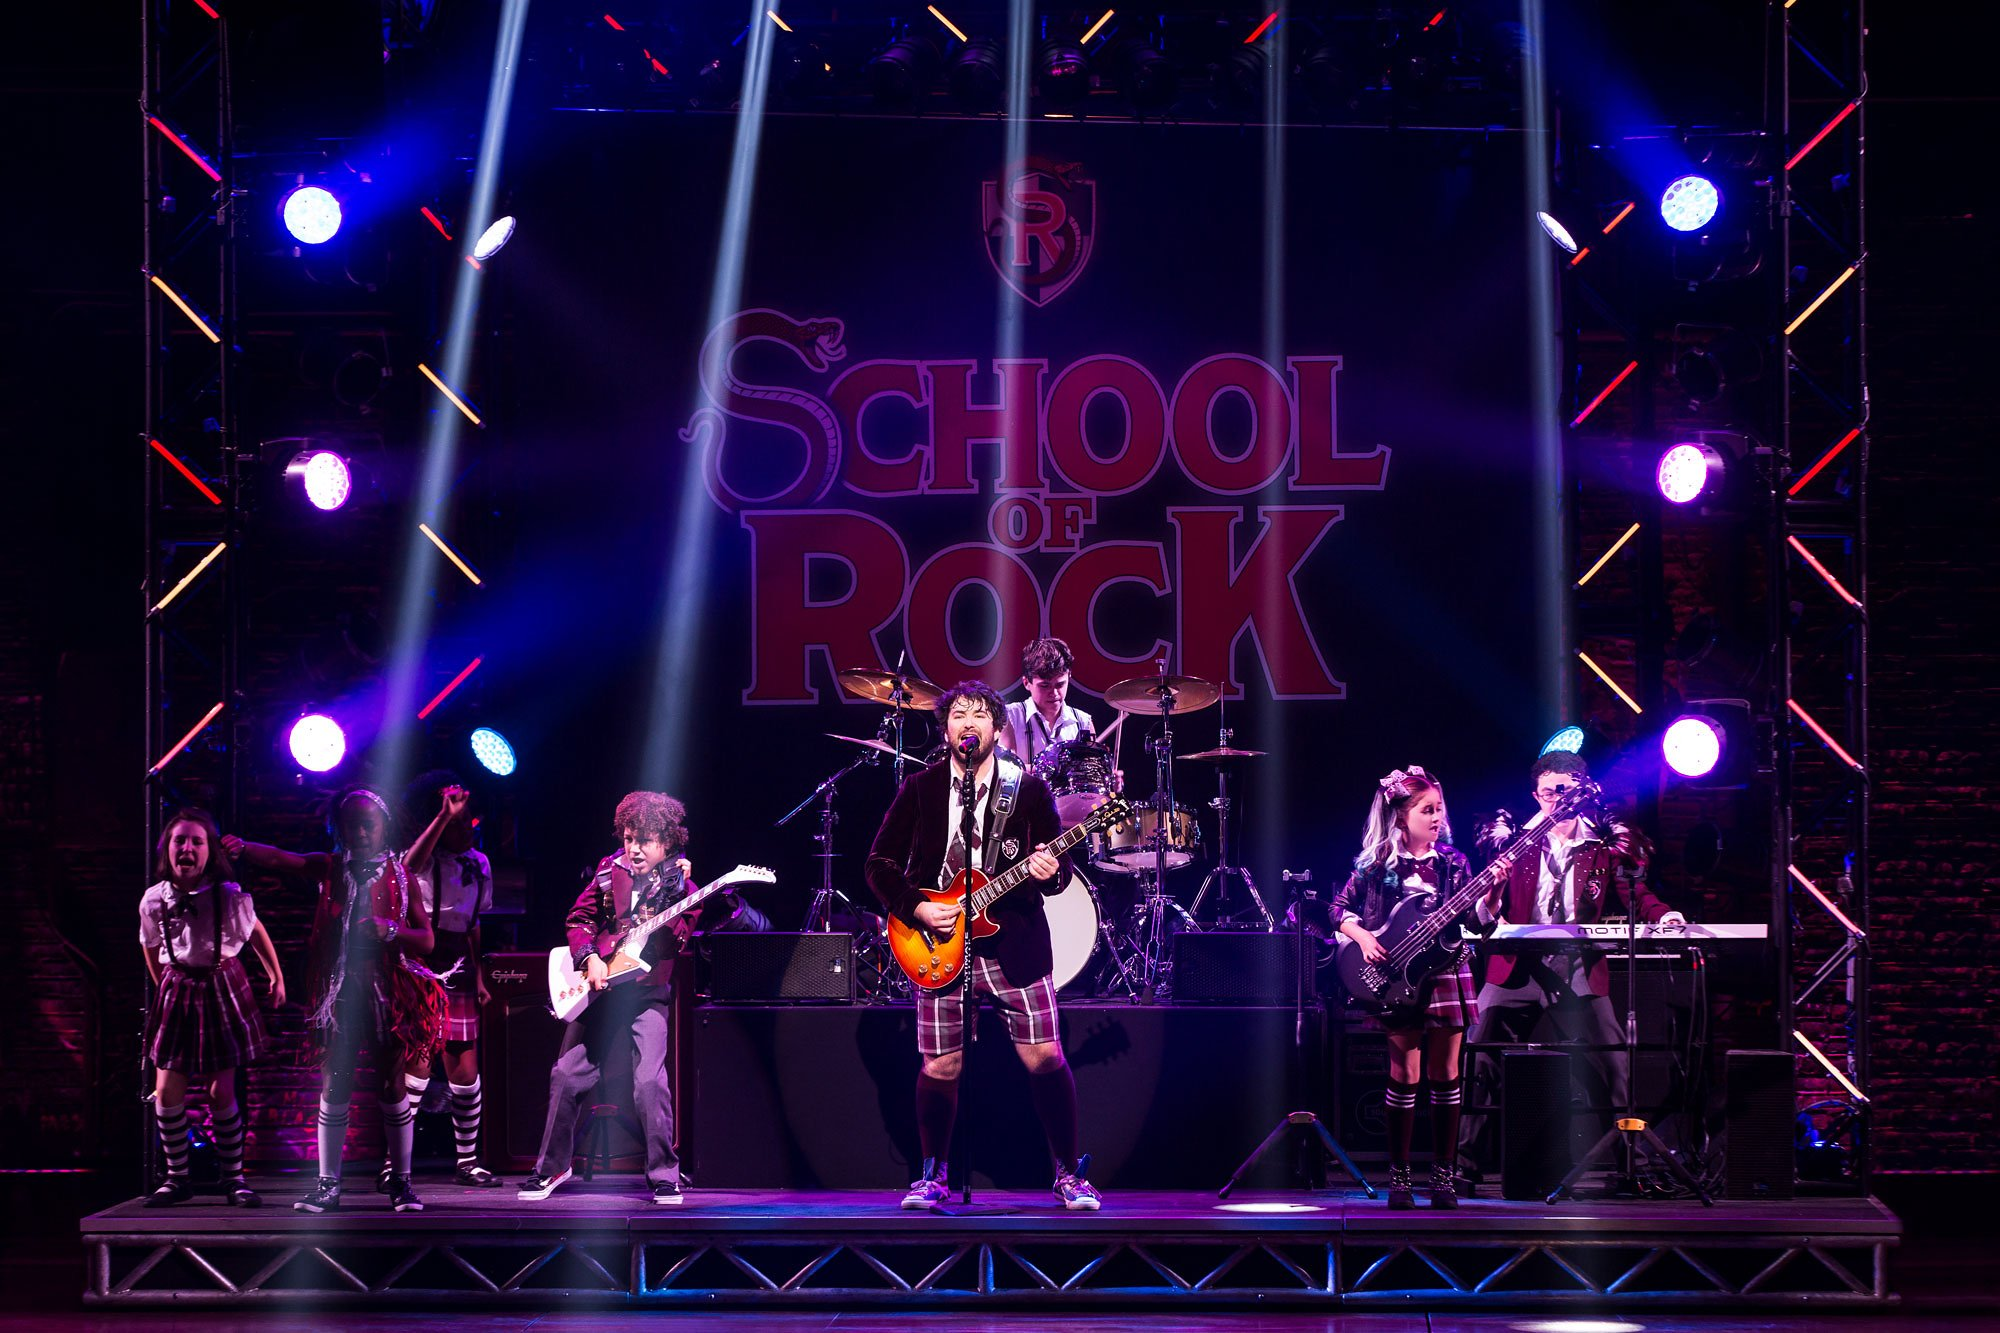 02-school-of-rock-broadway.jpg